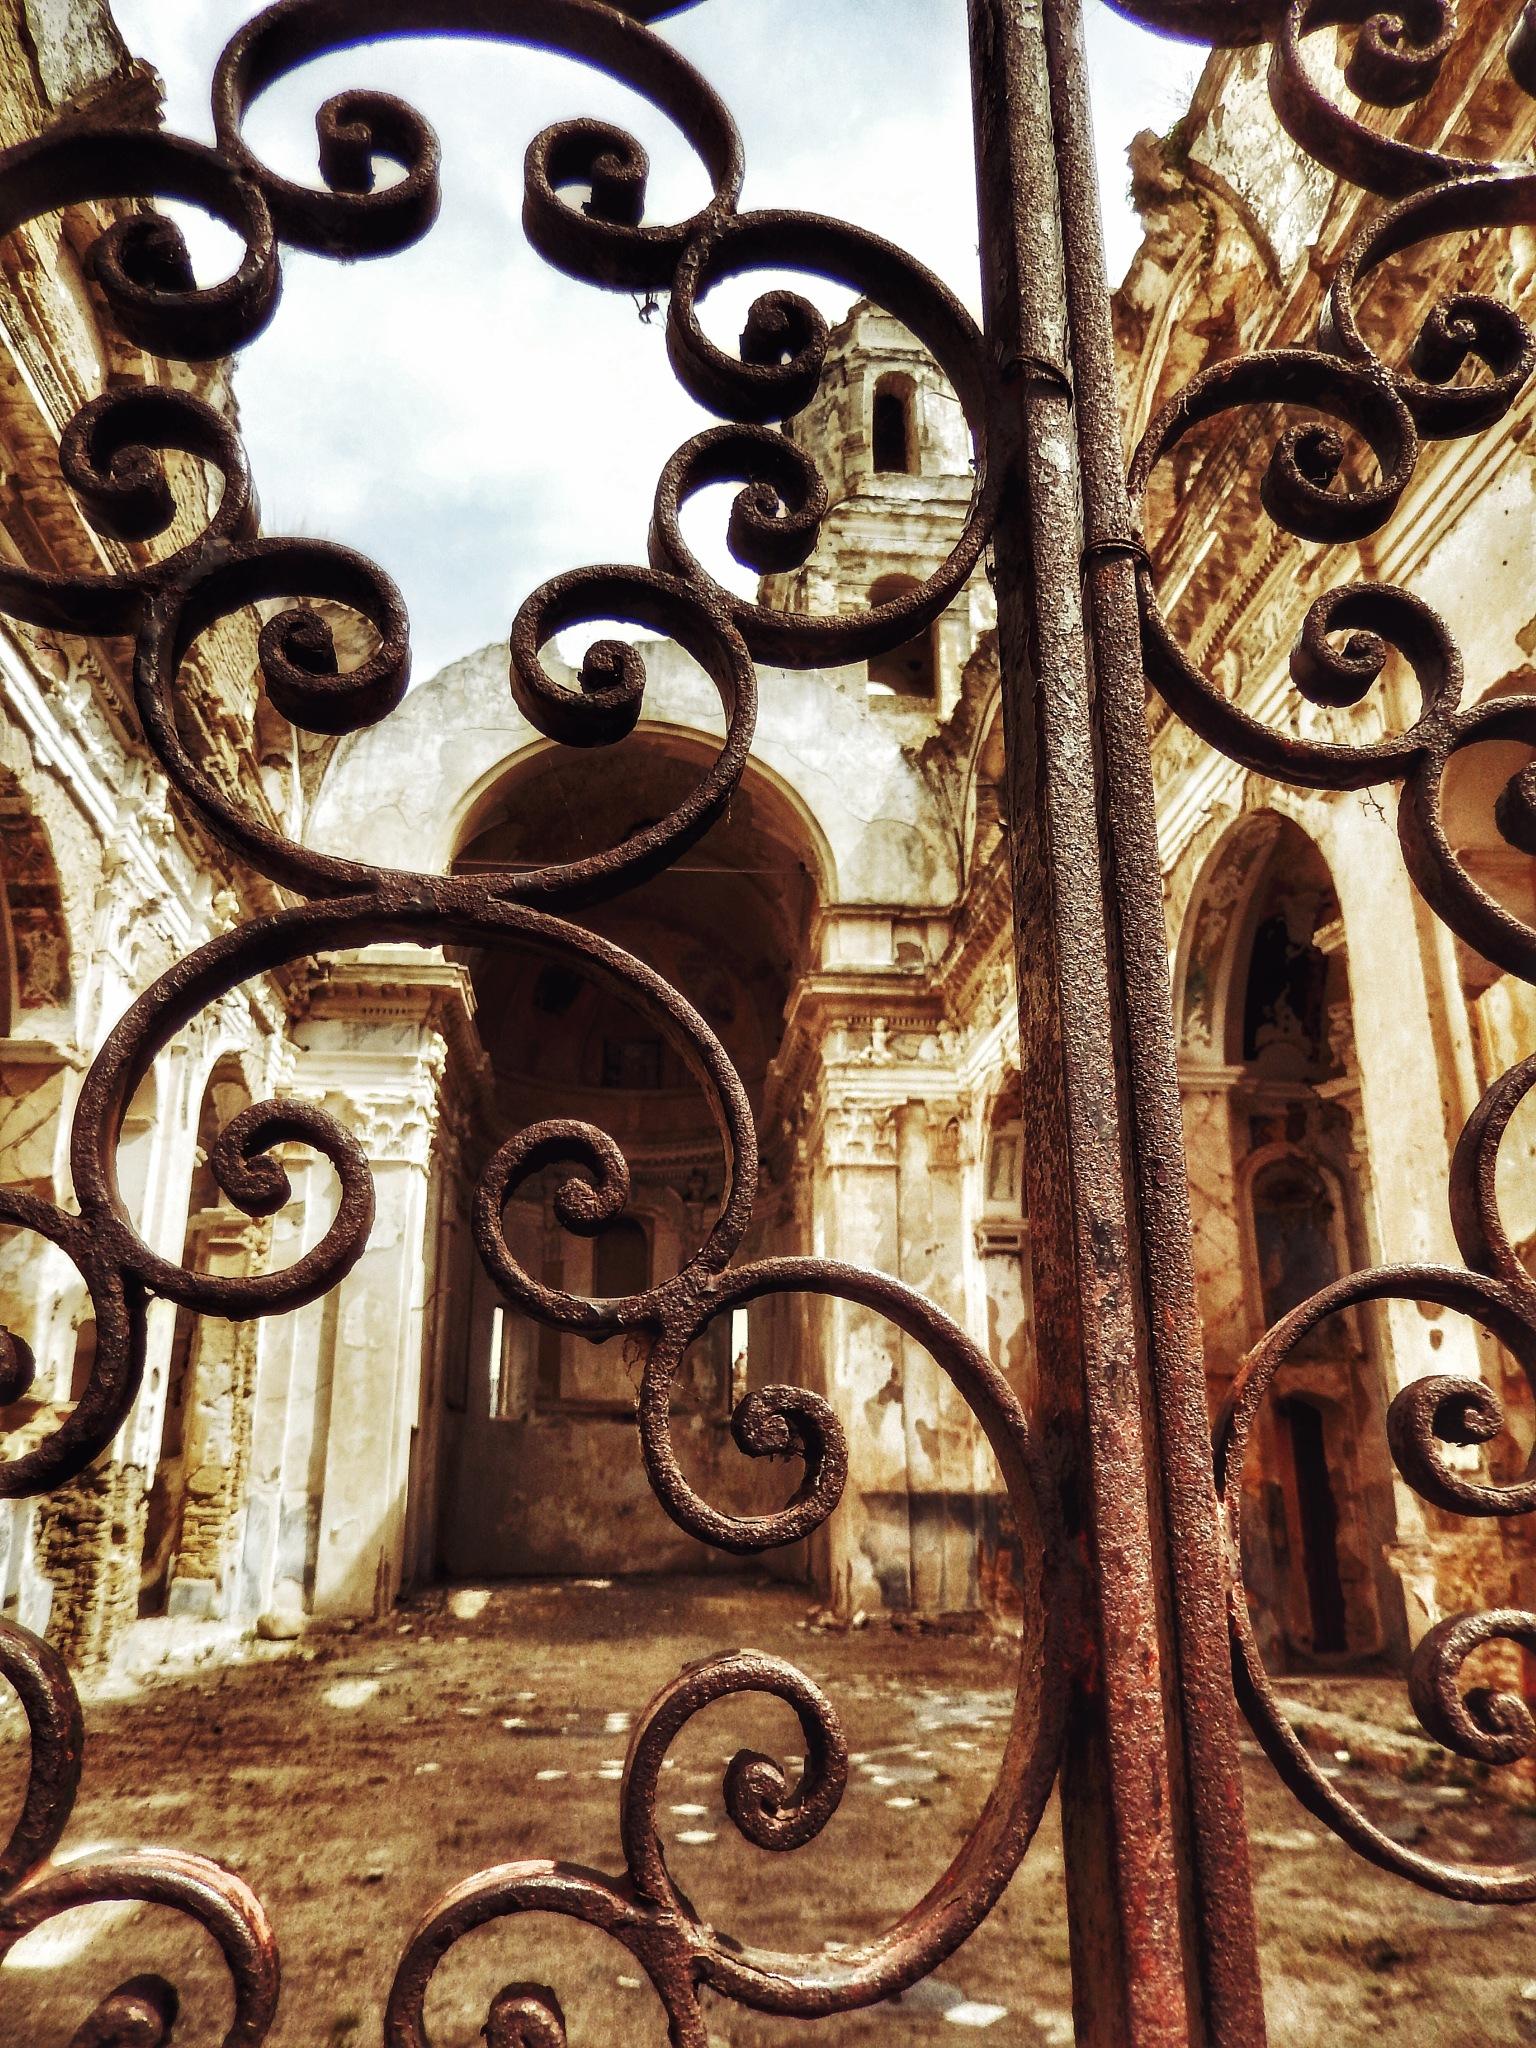 Desolate church ... by Jackie06